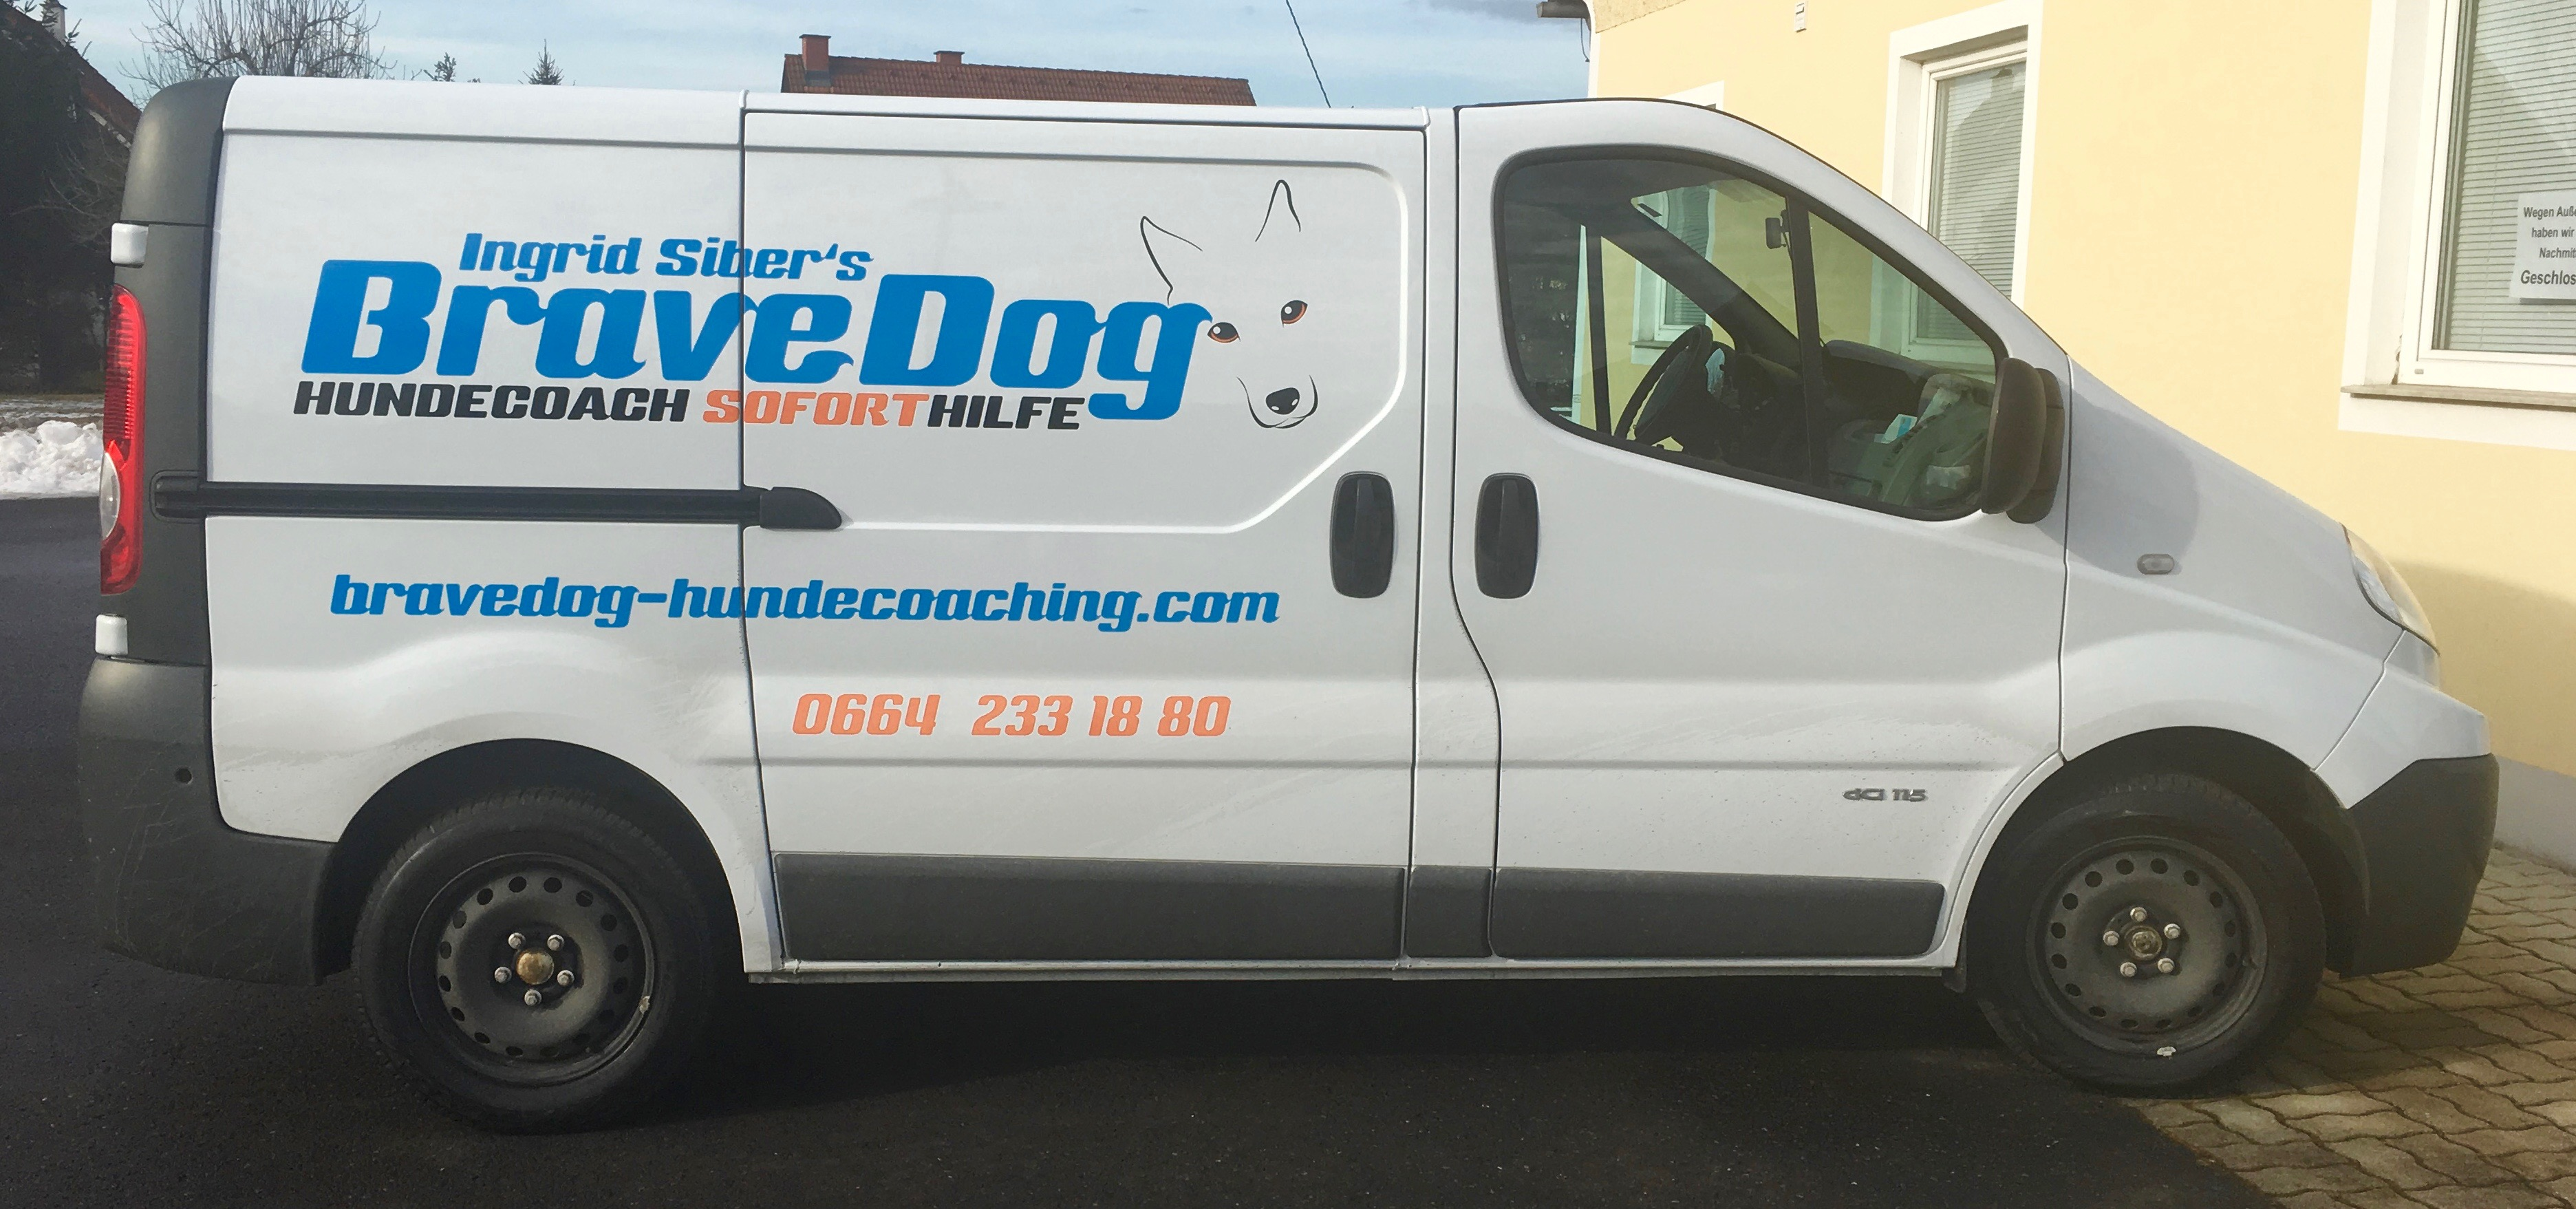 Dogmobil